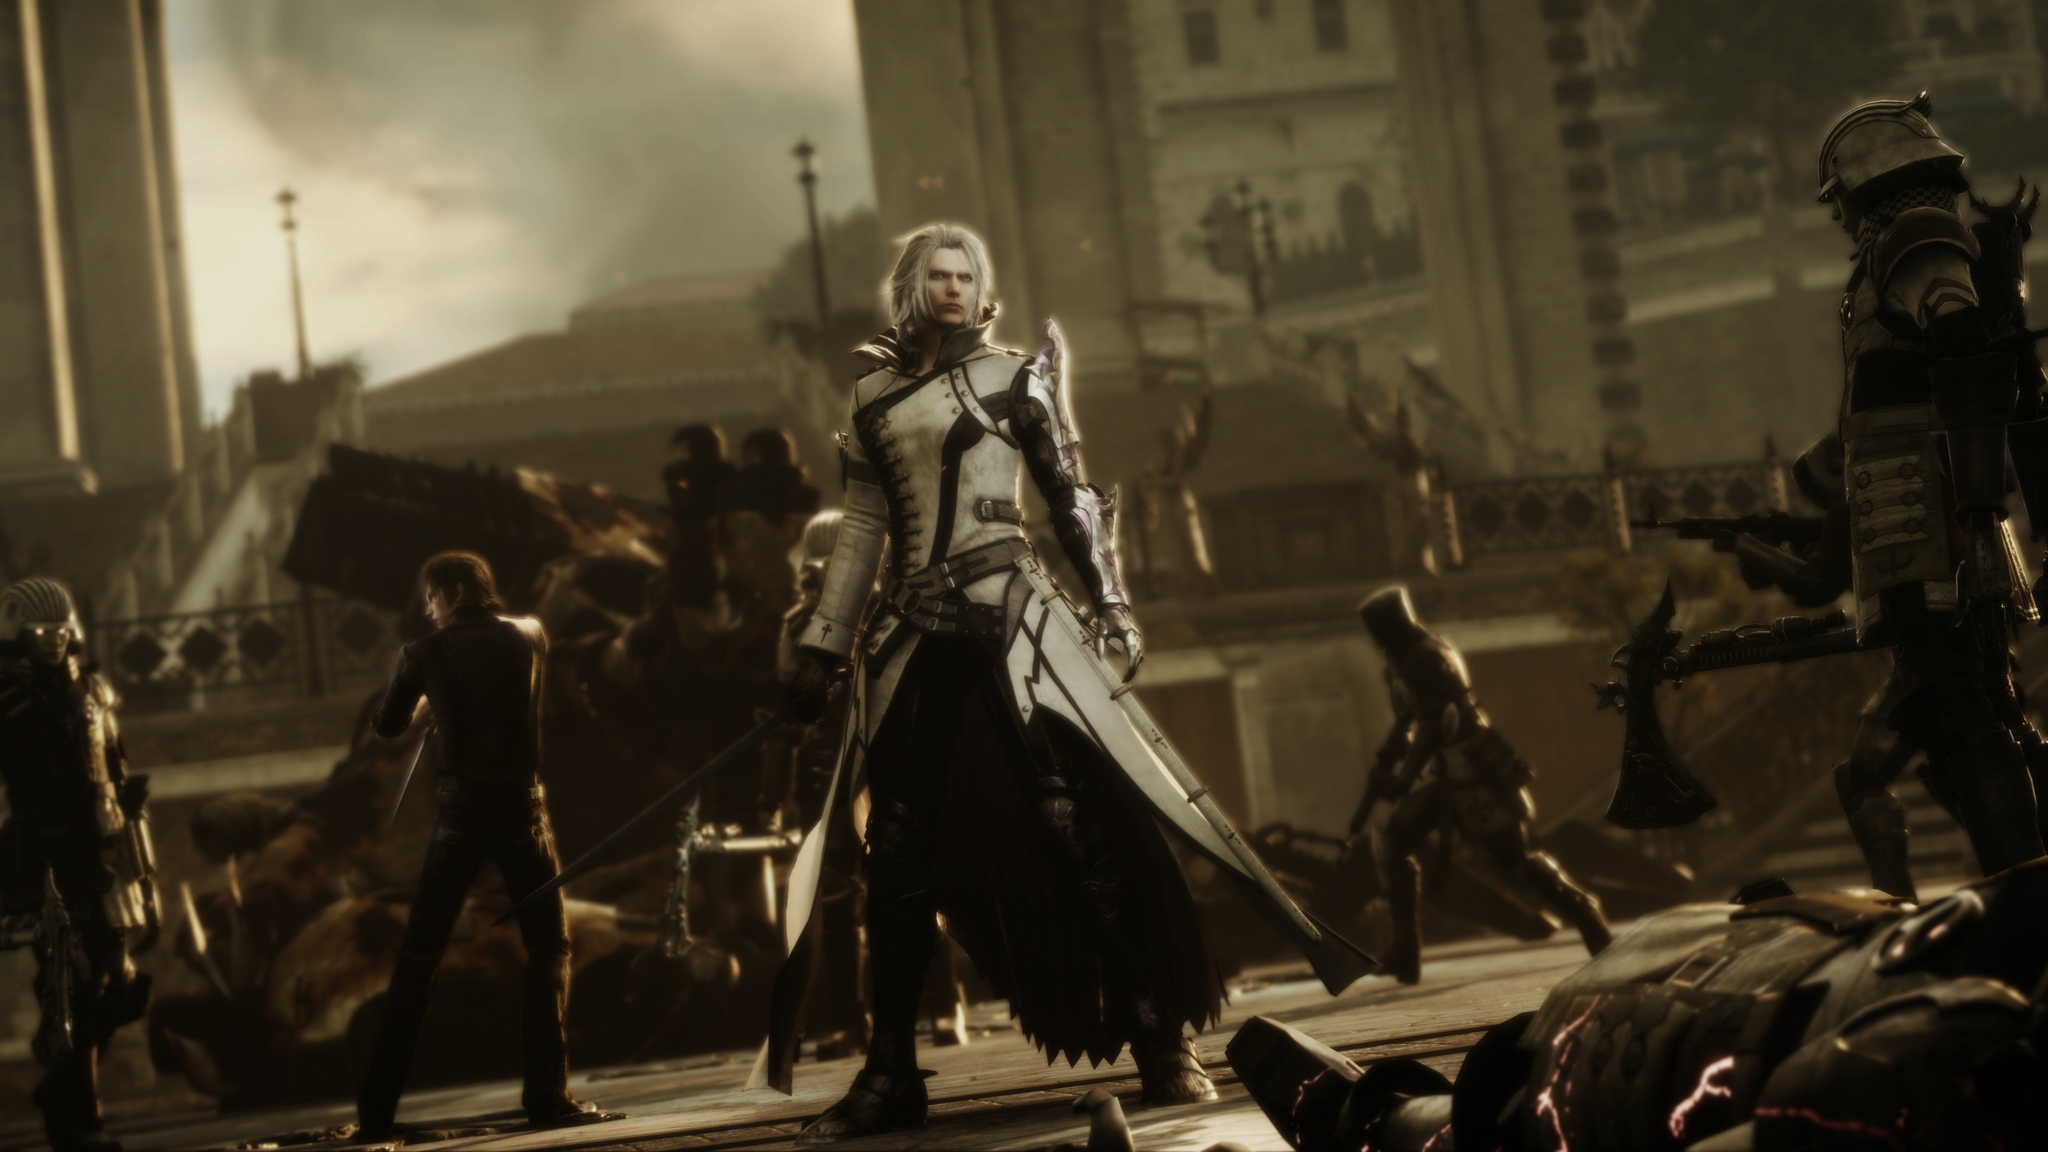 2560x1080 Luna Final Fantasy Xv 4k 2560x1080 Resolution Hd: 2048x1152 Final Fantasy Xv 4k 2048x1152 Resolution HD 4k